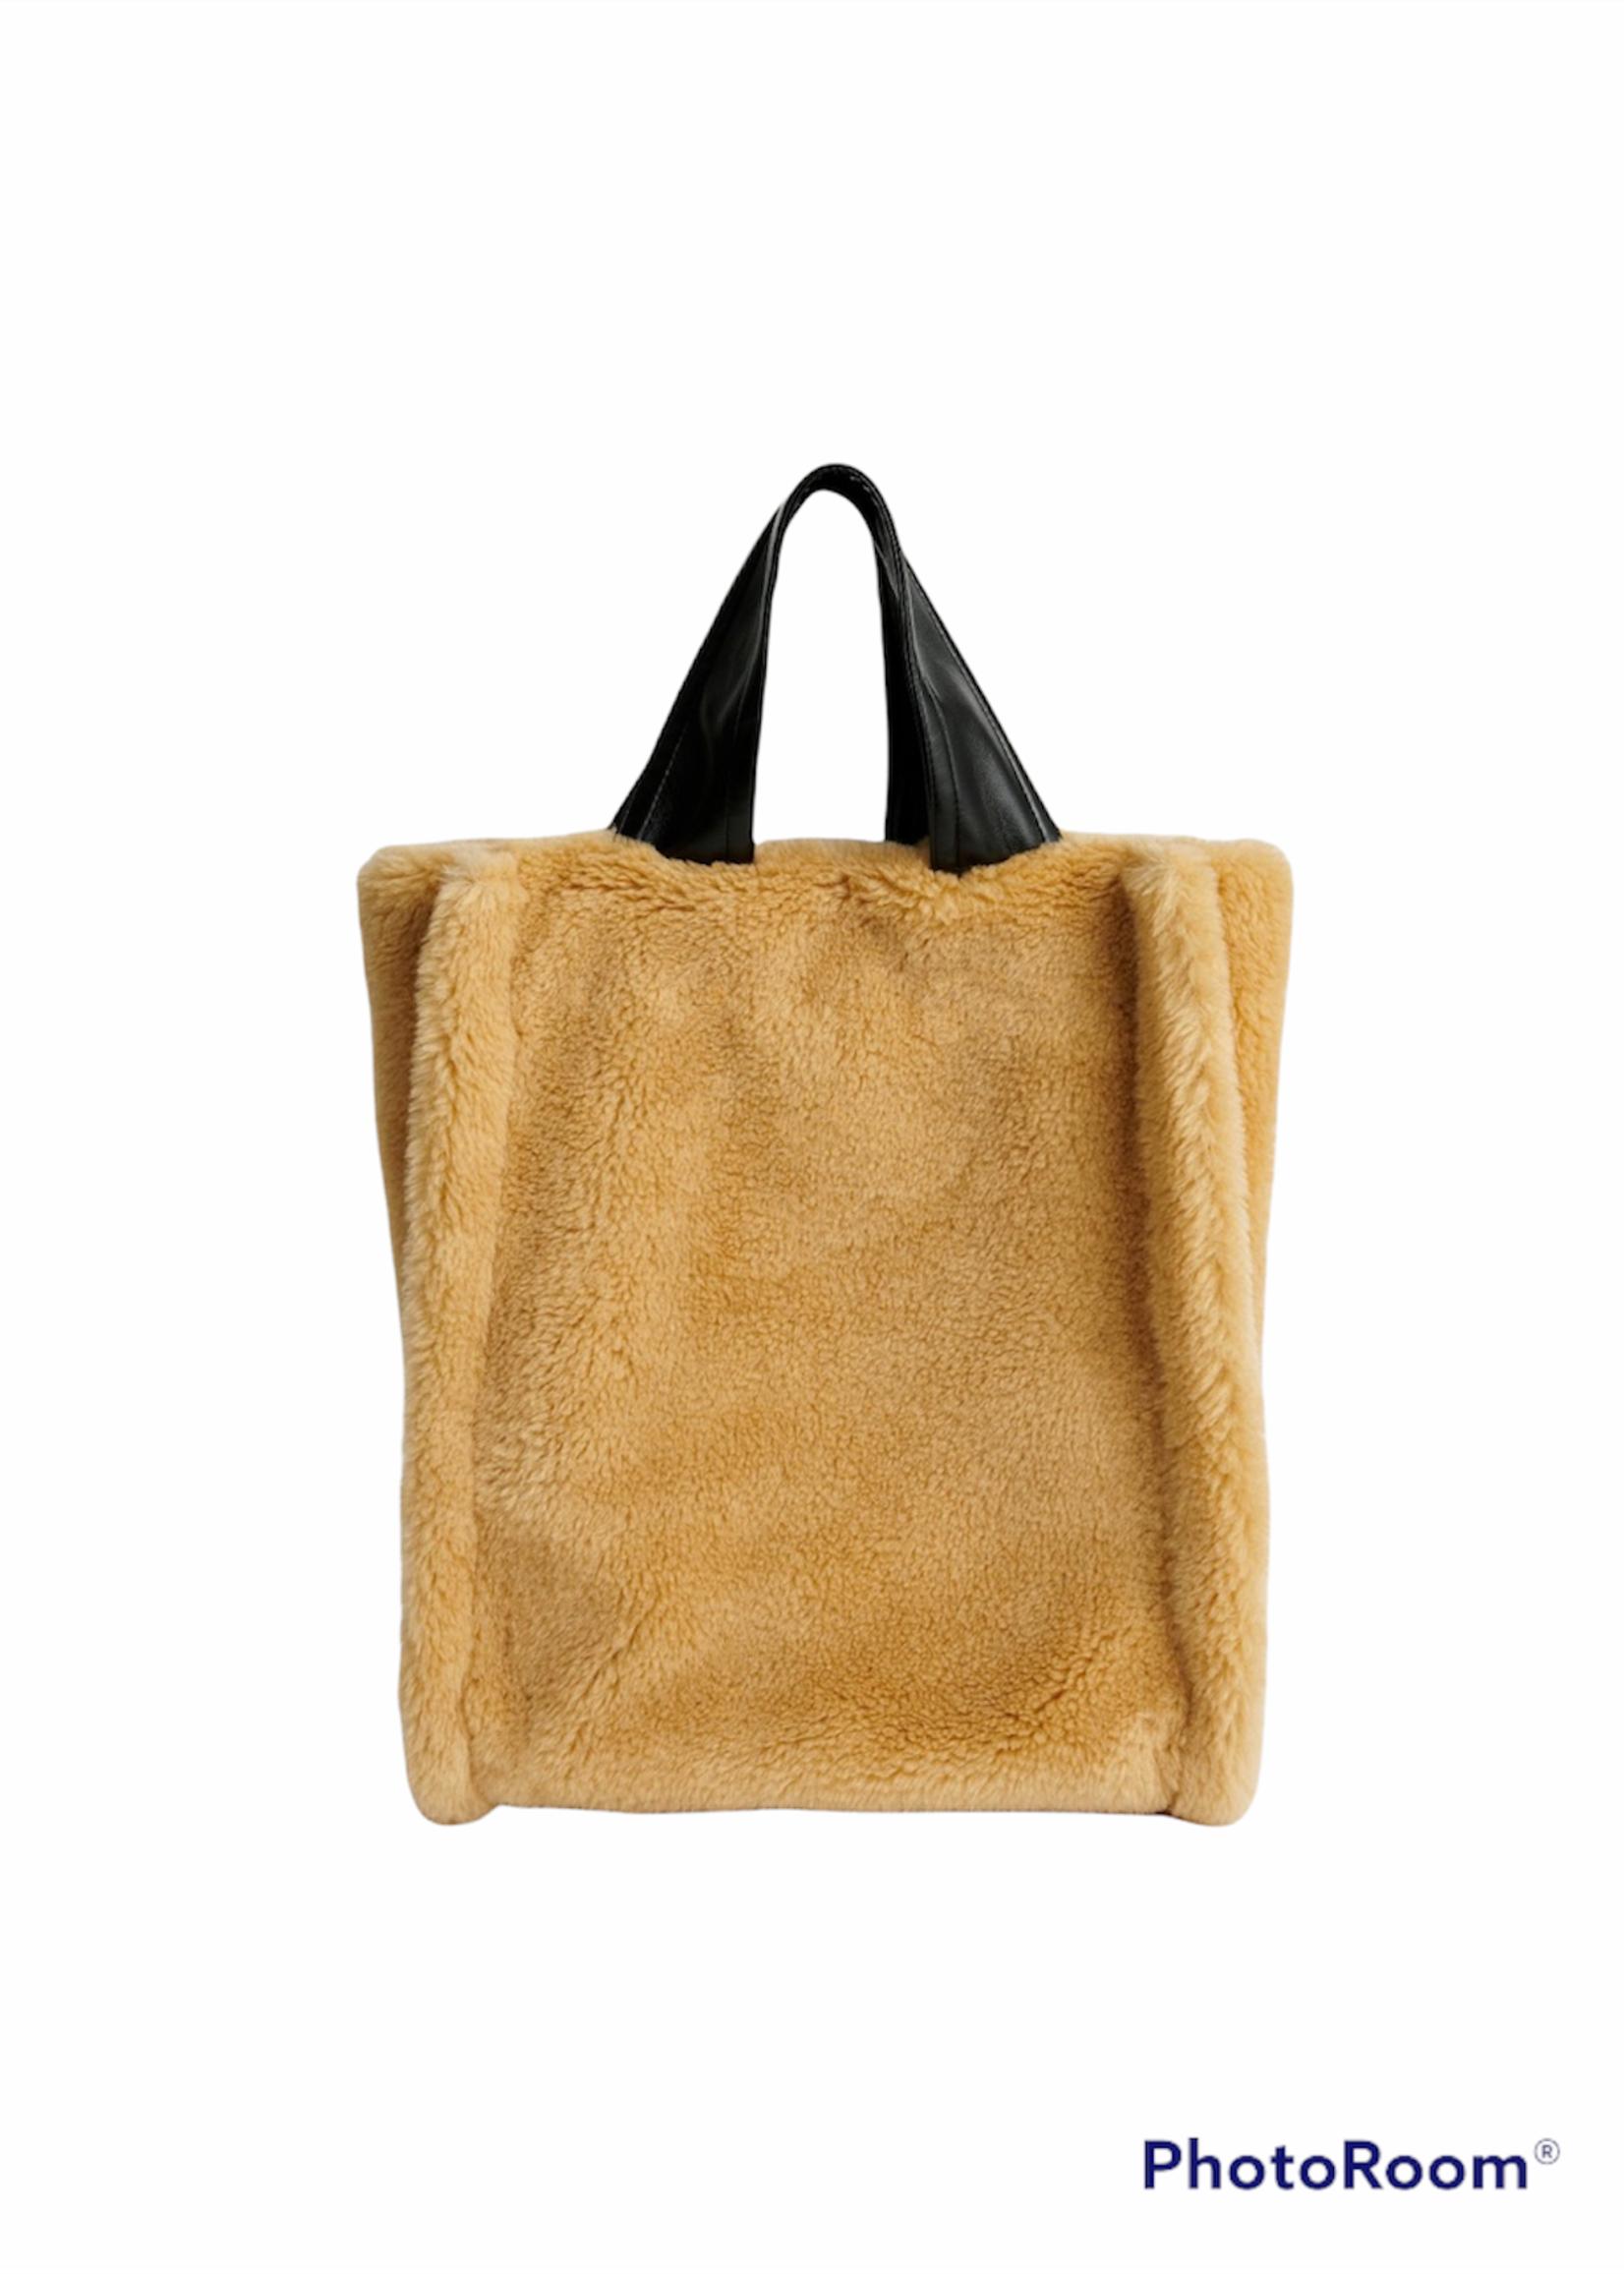 Guts & Goats Leia Bag